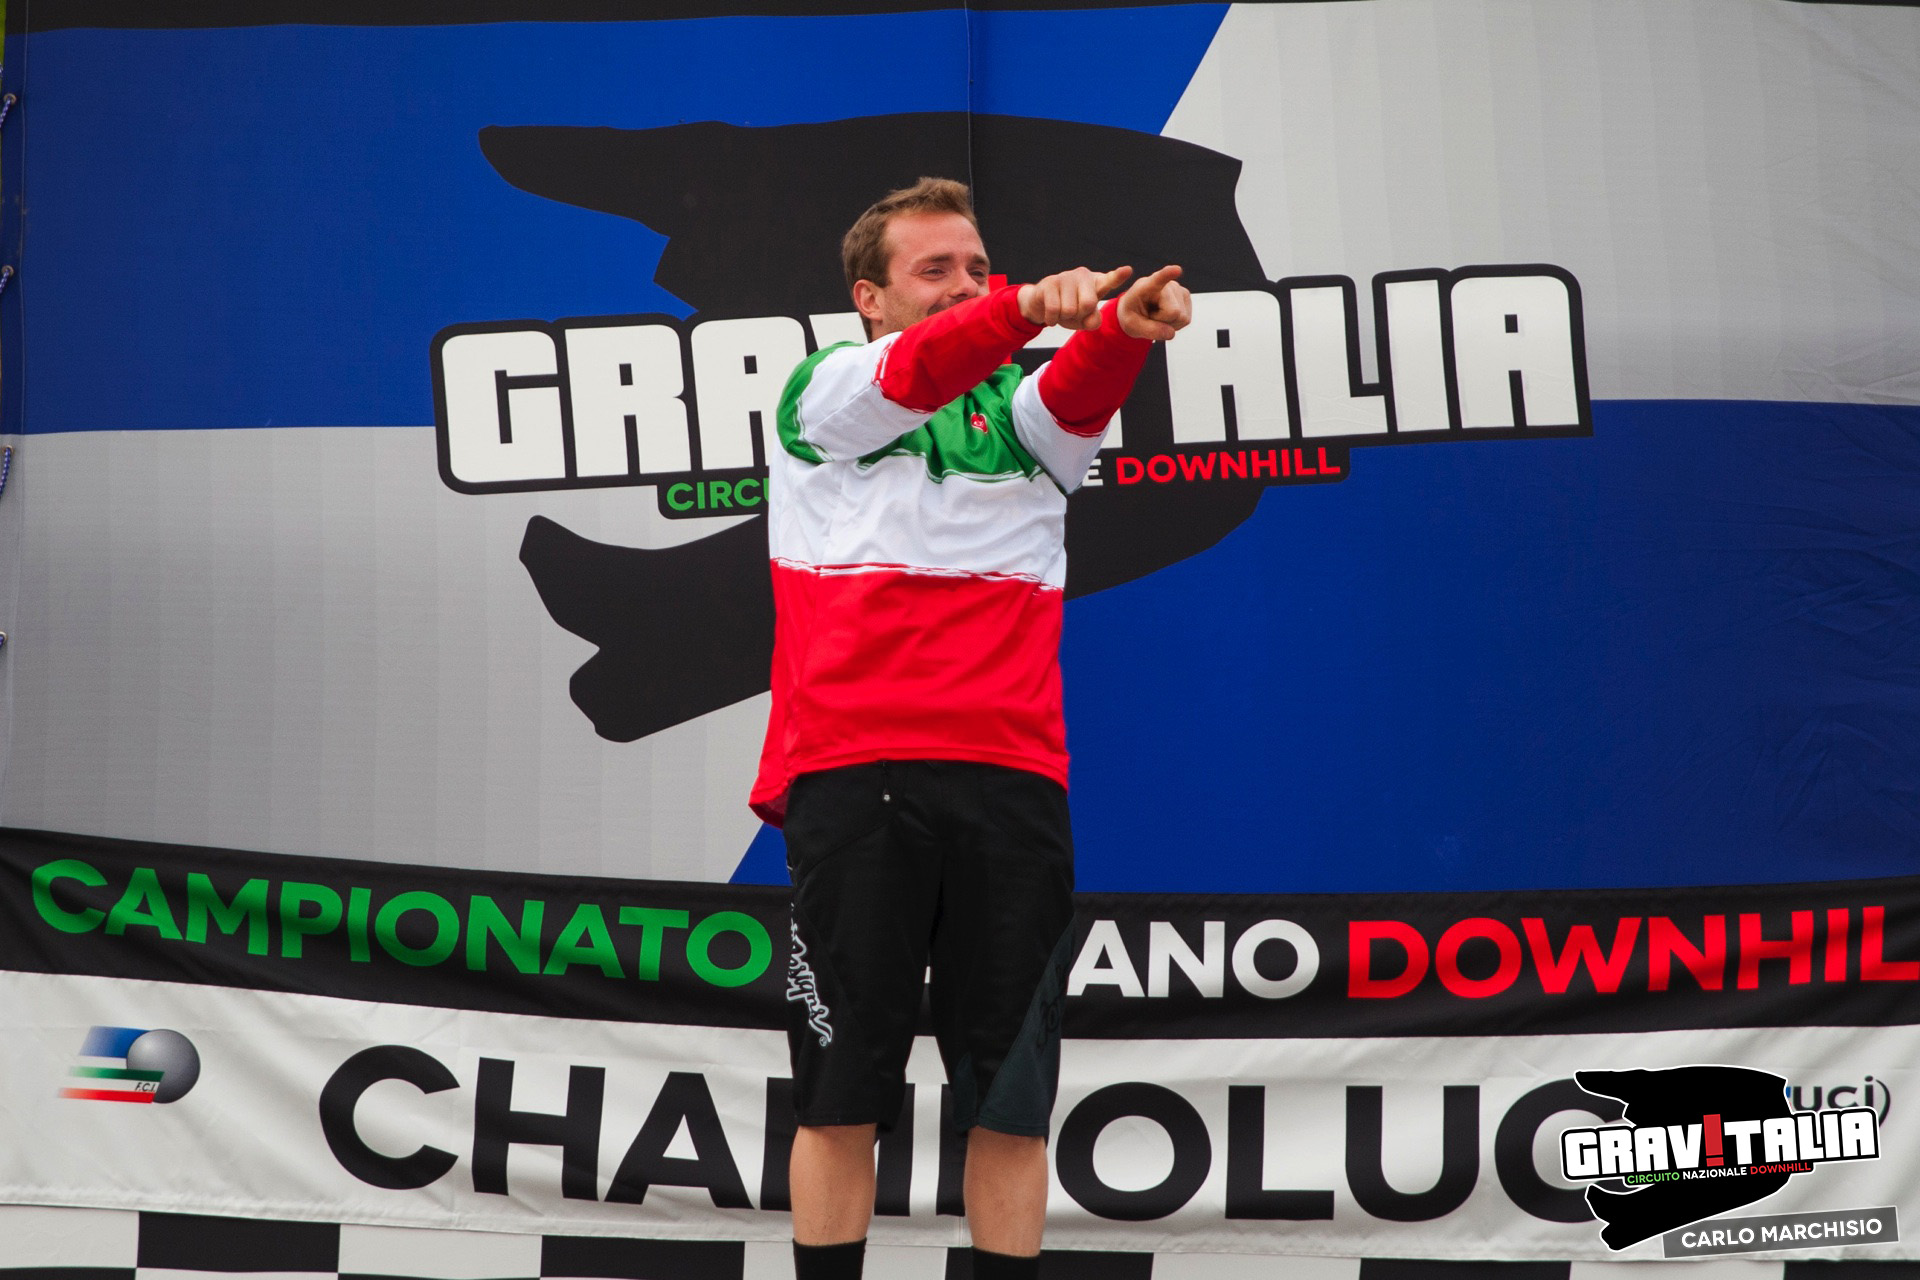 PhotoCarloMarchisio_CampionatiItaliani2014_Champoluc_039 copia